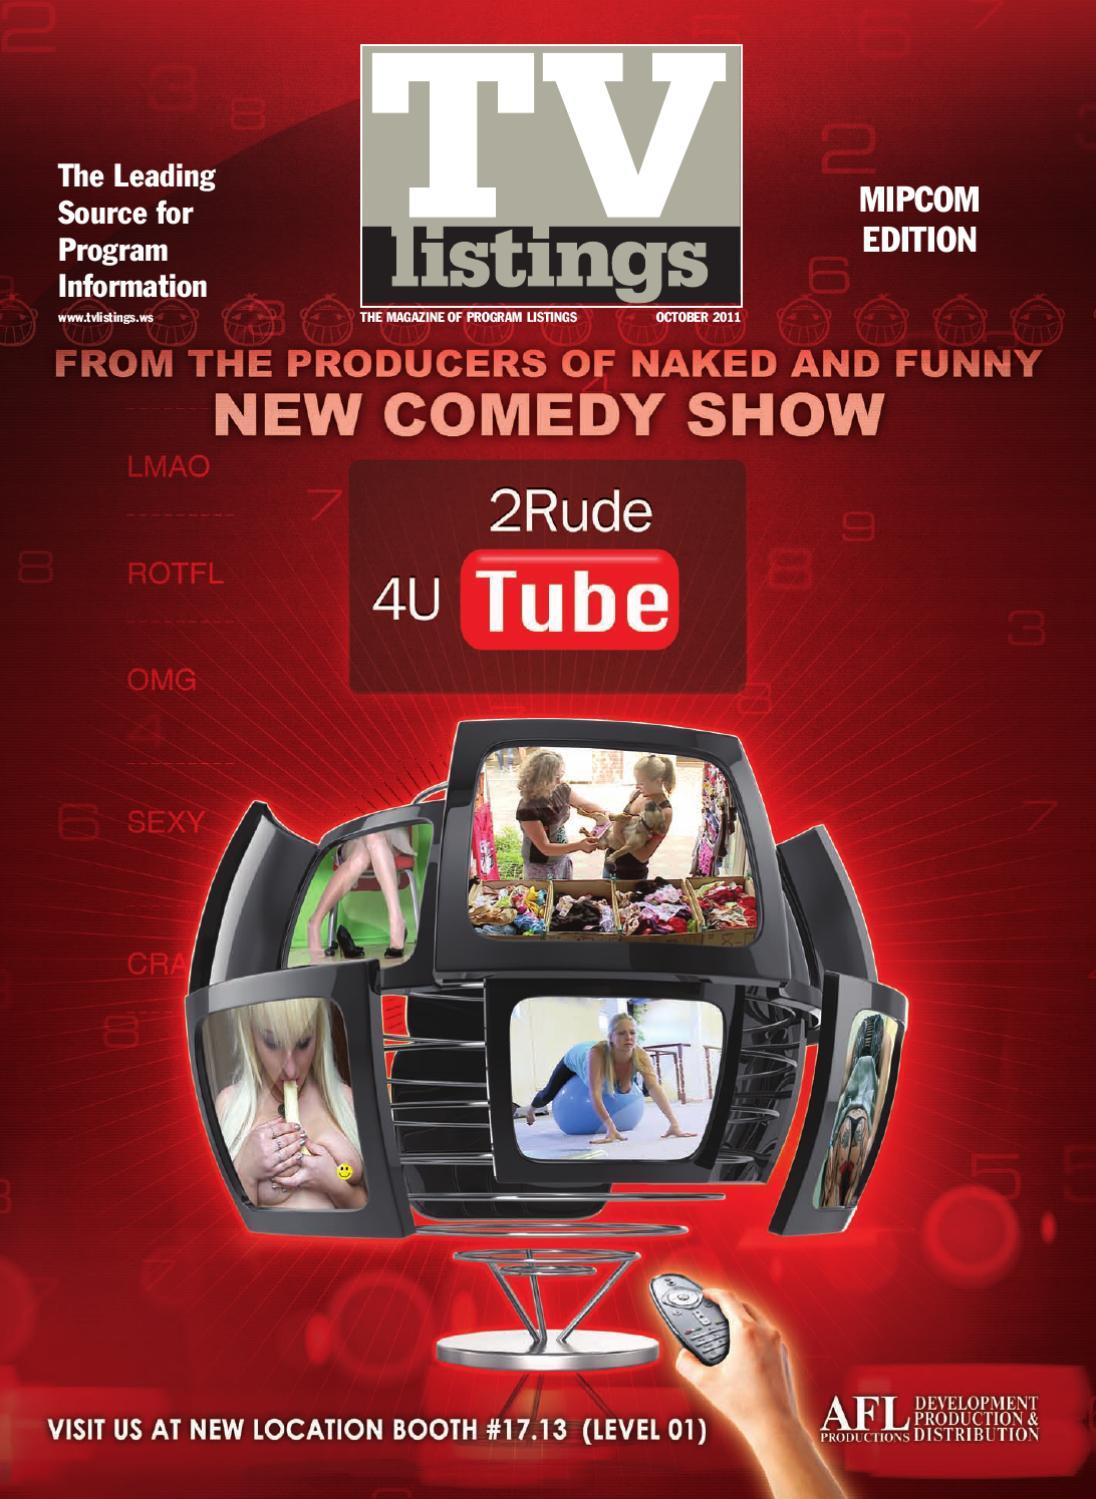 TV Listings MIPCOM 2011 by World Screen - issuu